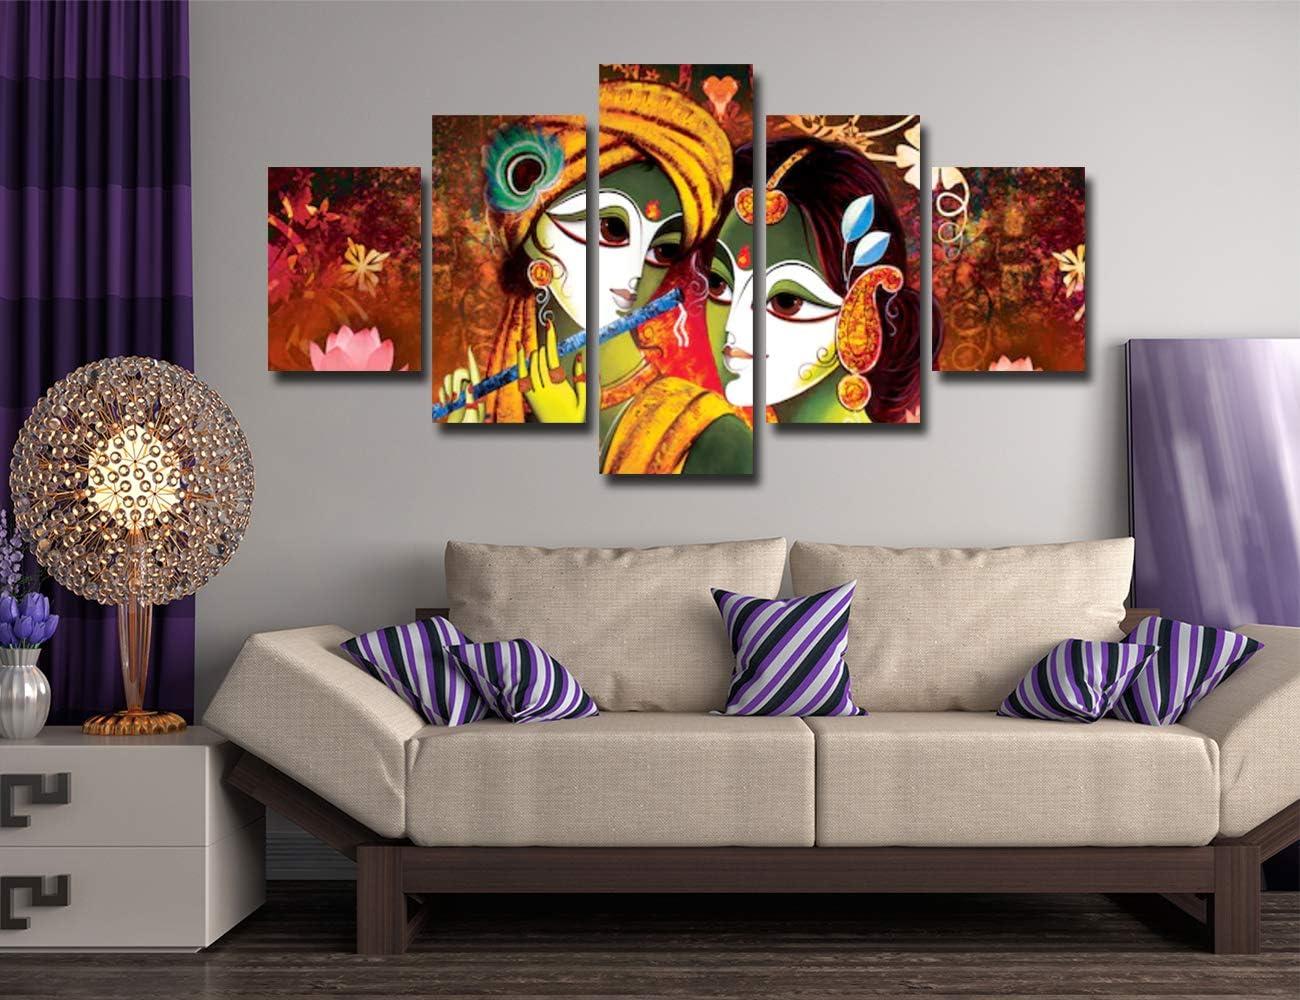 Radha Krishna Art Painting 5 Panels Image for Living Room Walls #360 HKTPIC-UK